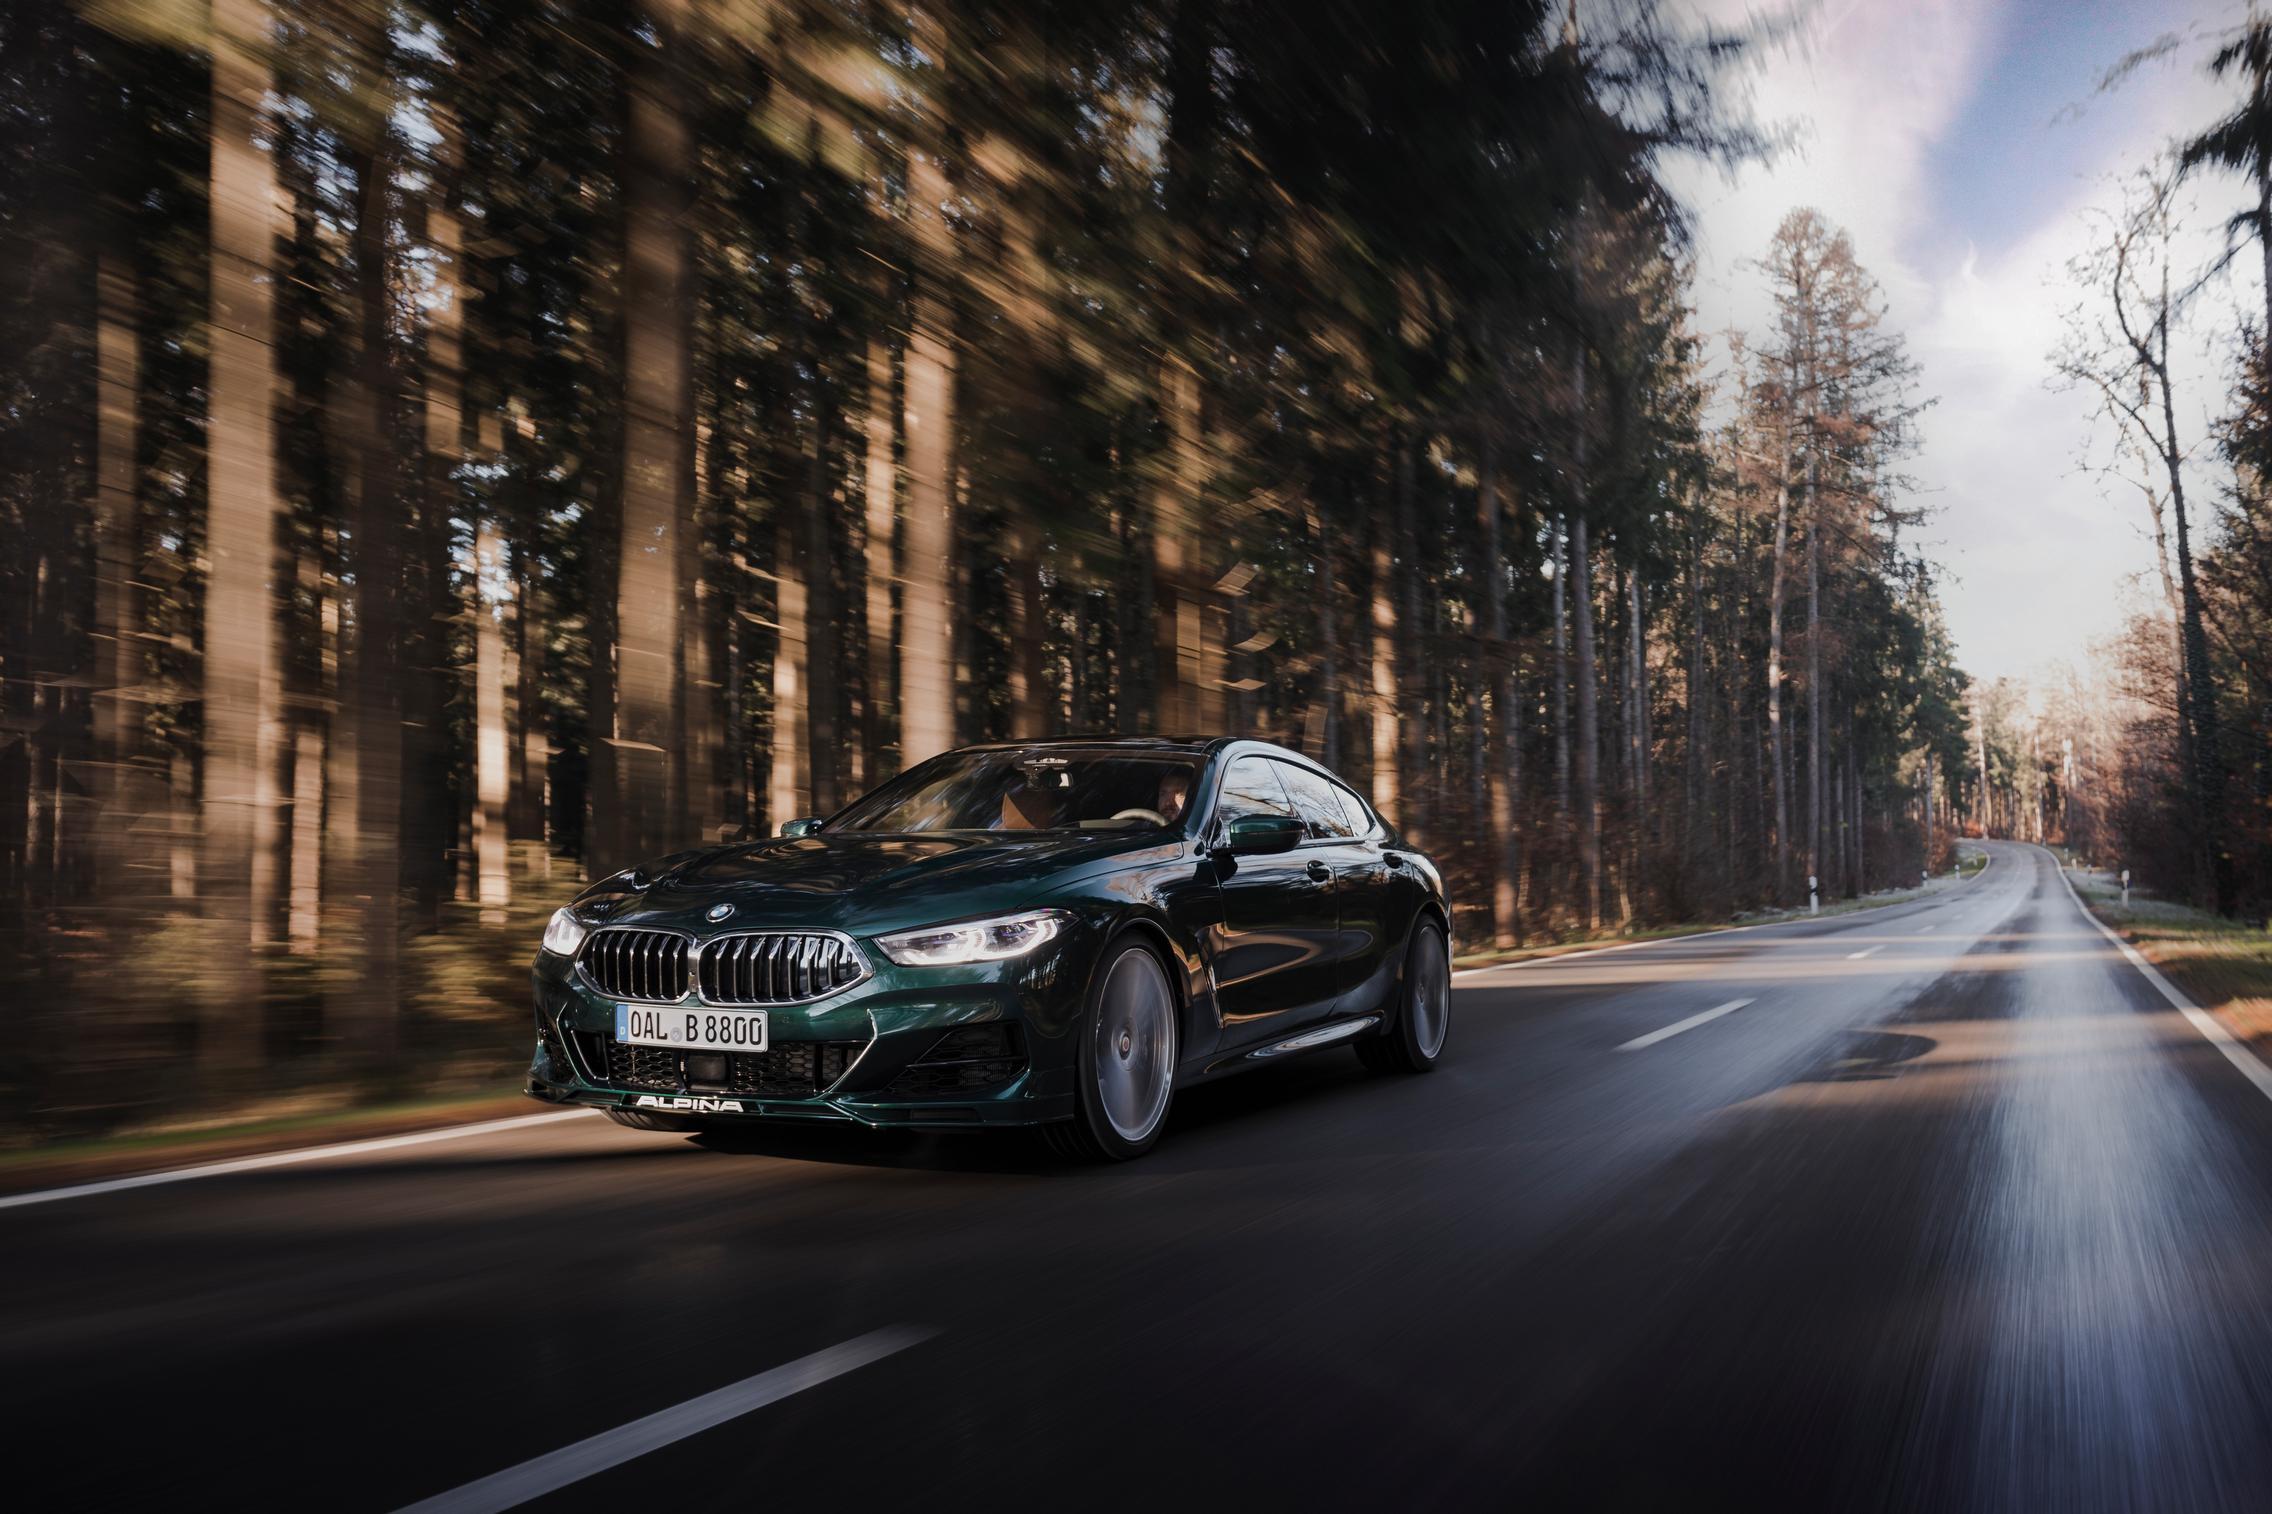 BMW-Alpina-B8-Gran-Coupe-wallpaper